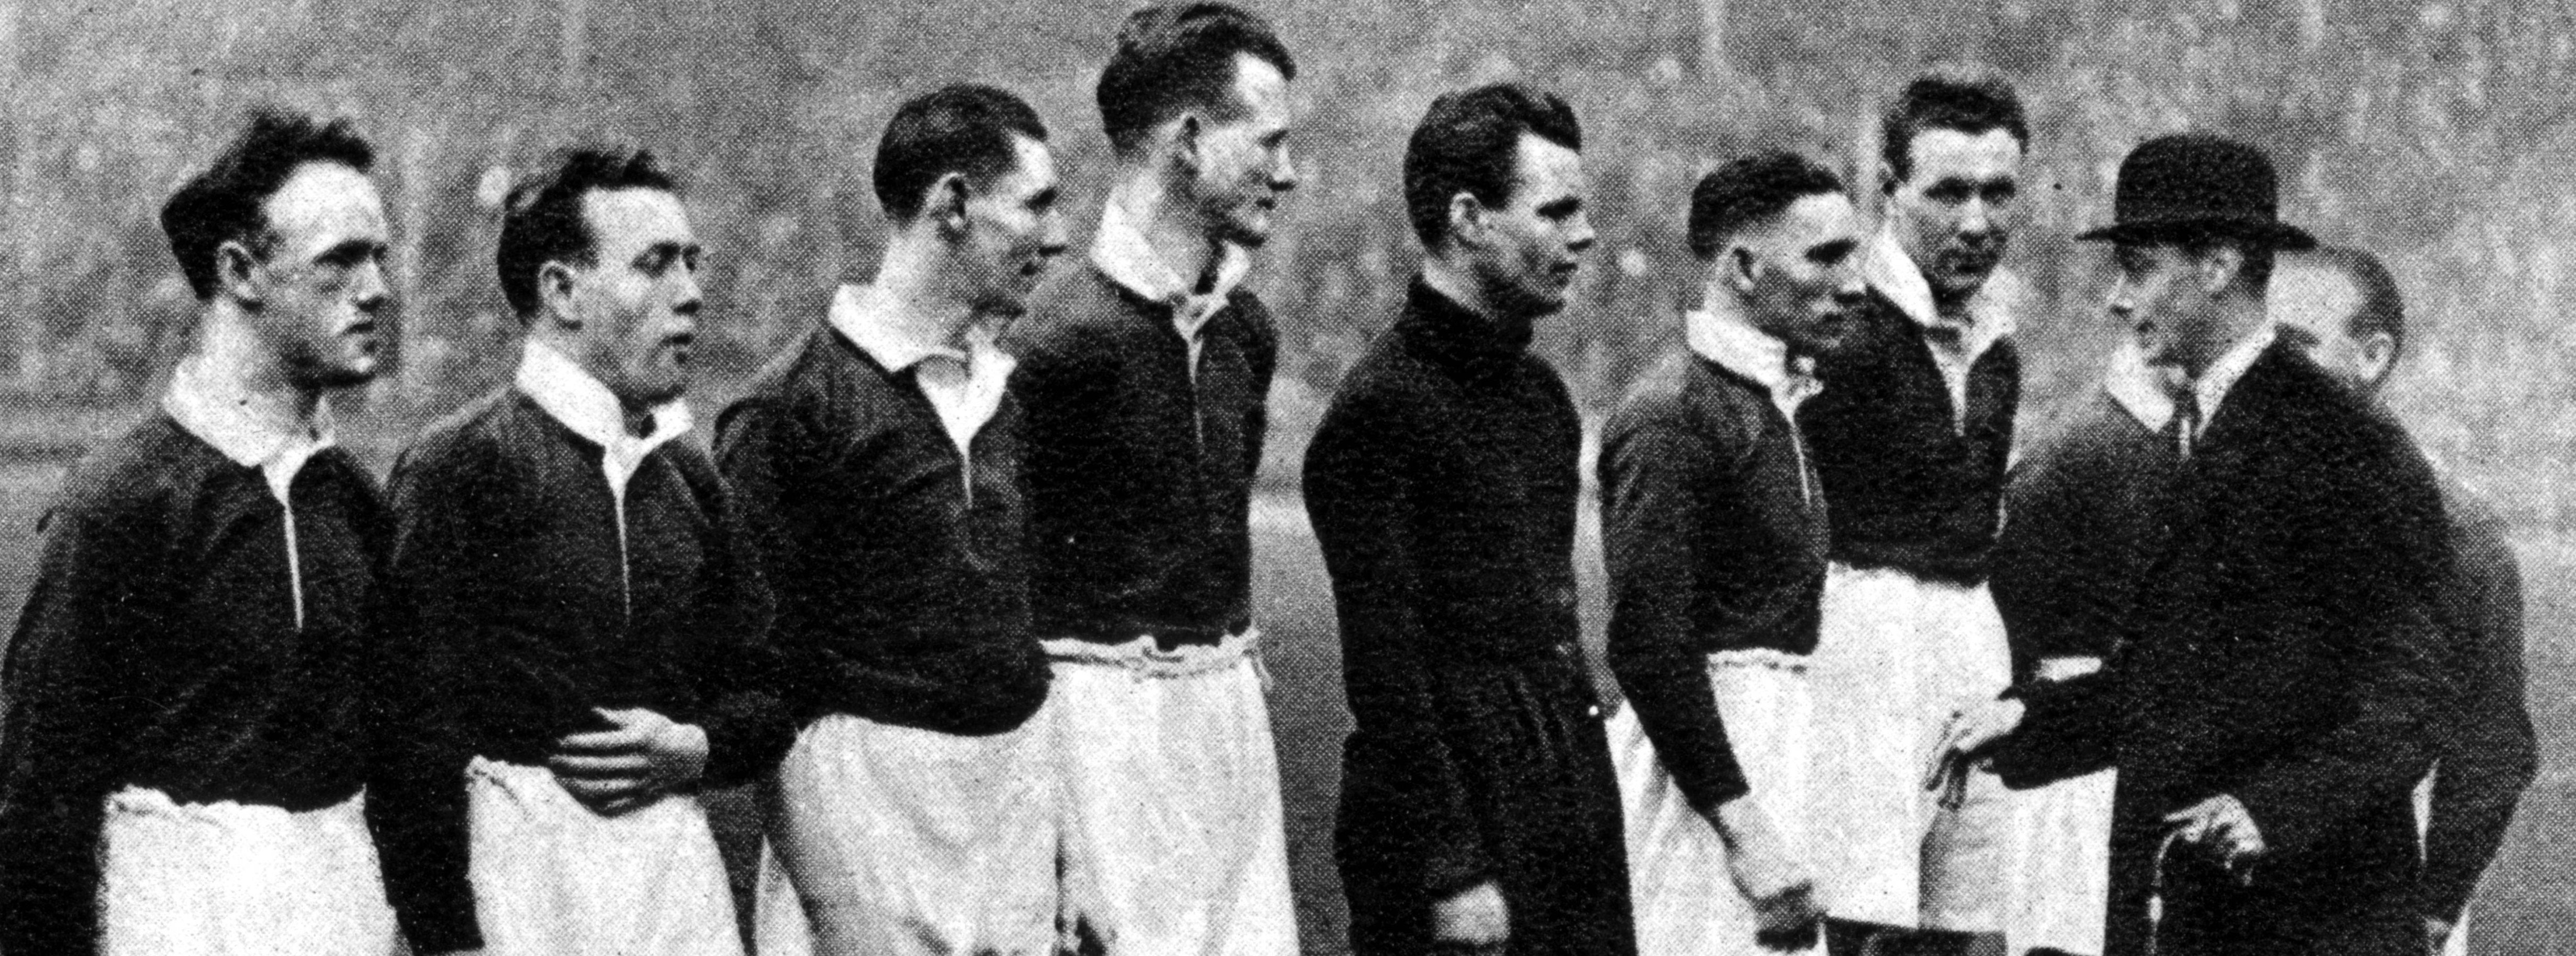 "Recalling Scotland's ""Wee Blue Devils"" of 1928"